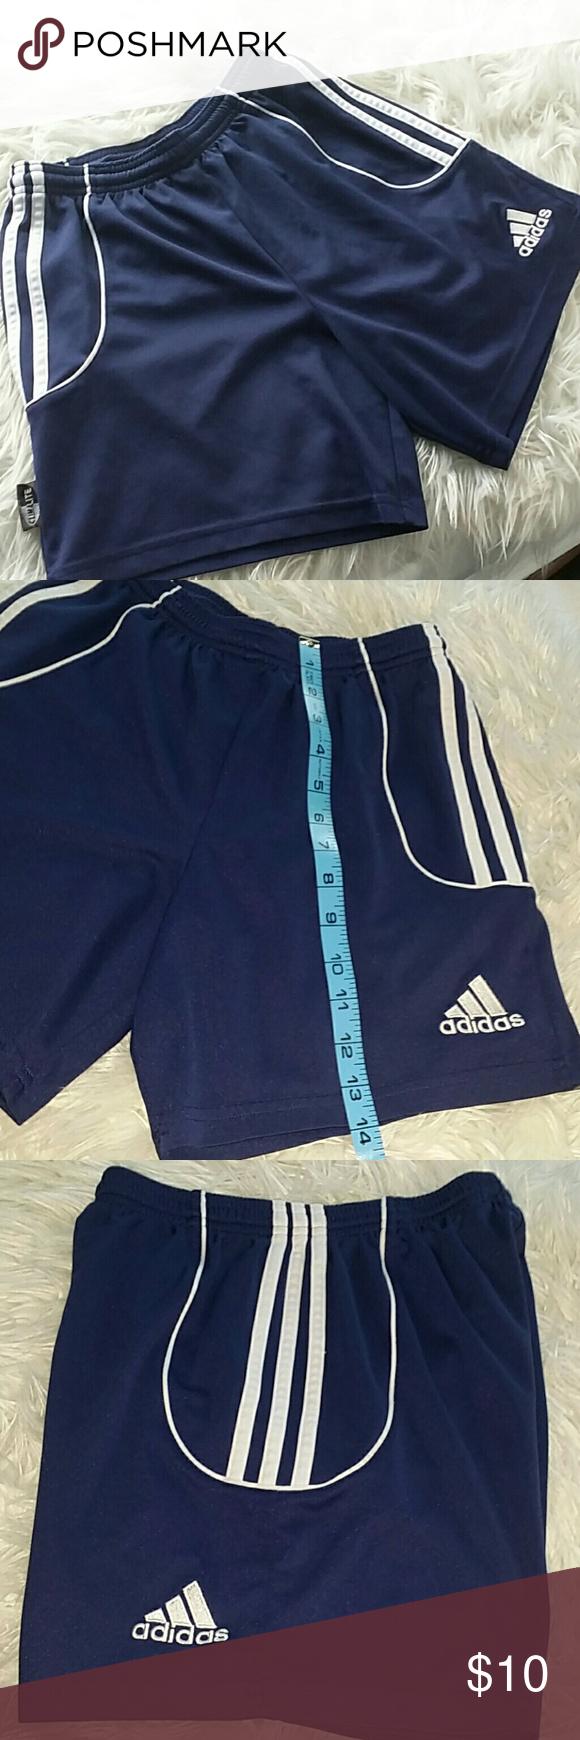 Adidas athletic shorts Kid's Adidas Climalite athletic shorts adidas Bottoms Shorts